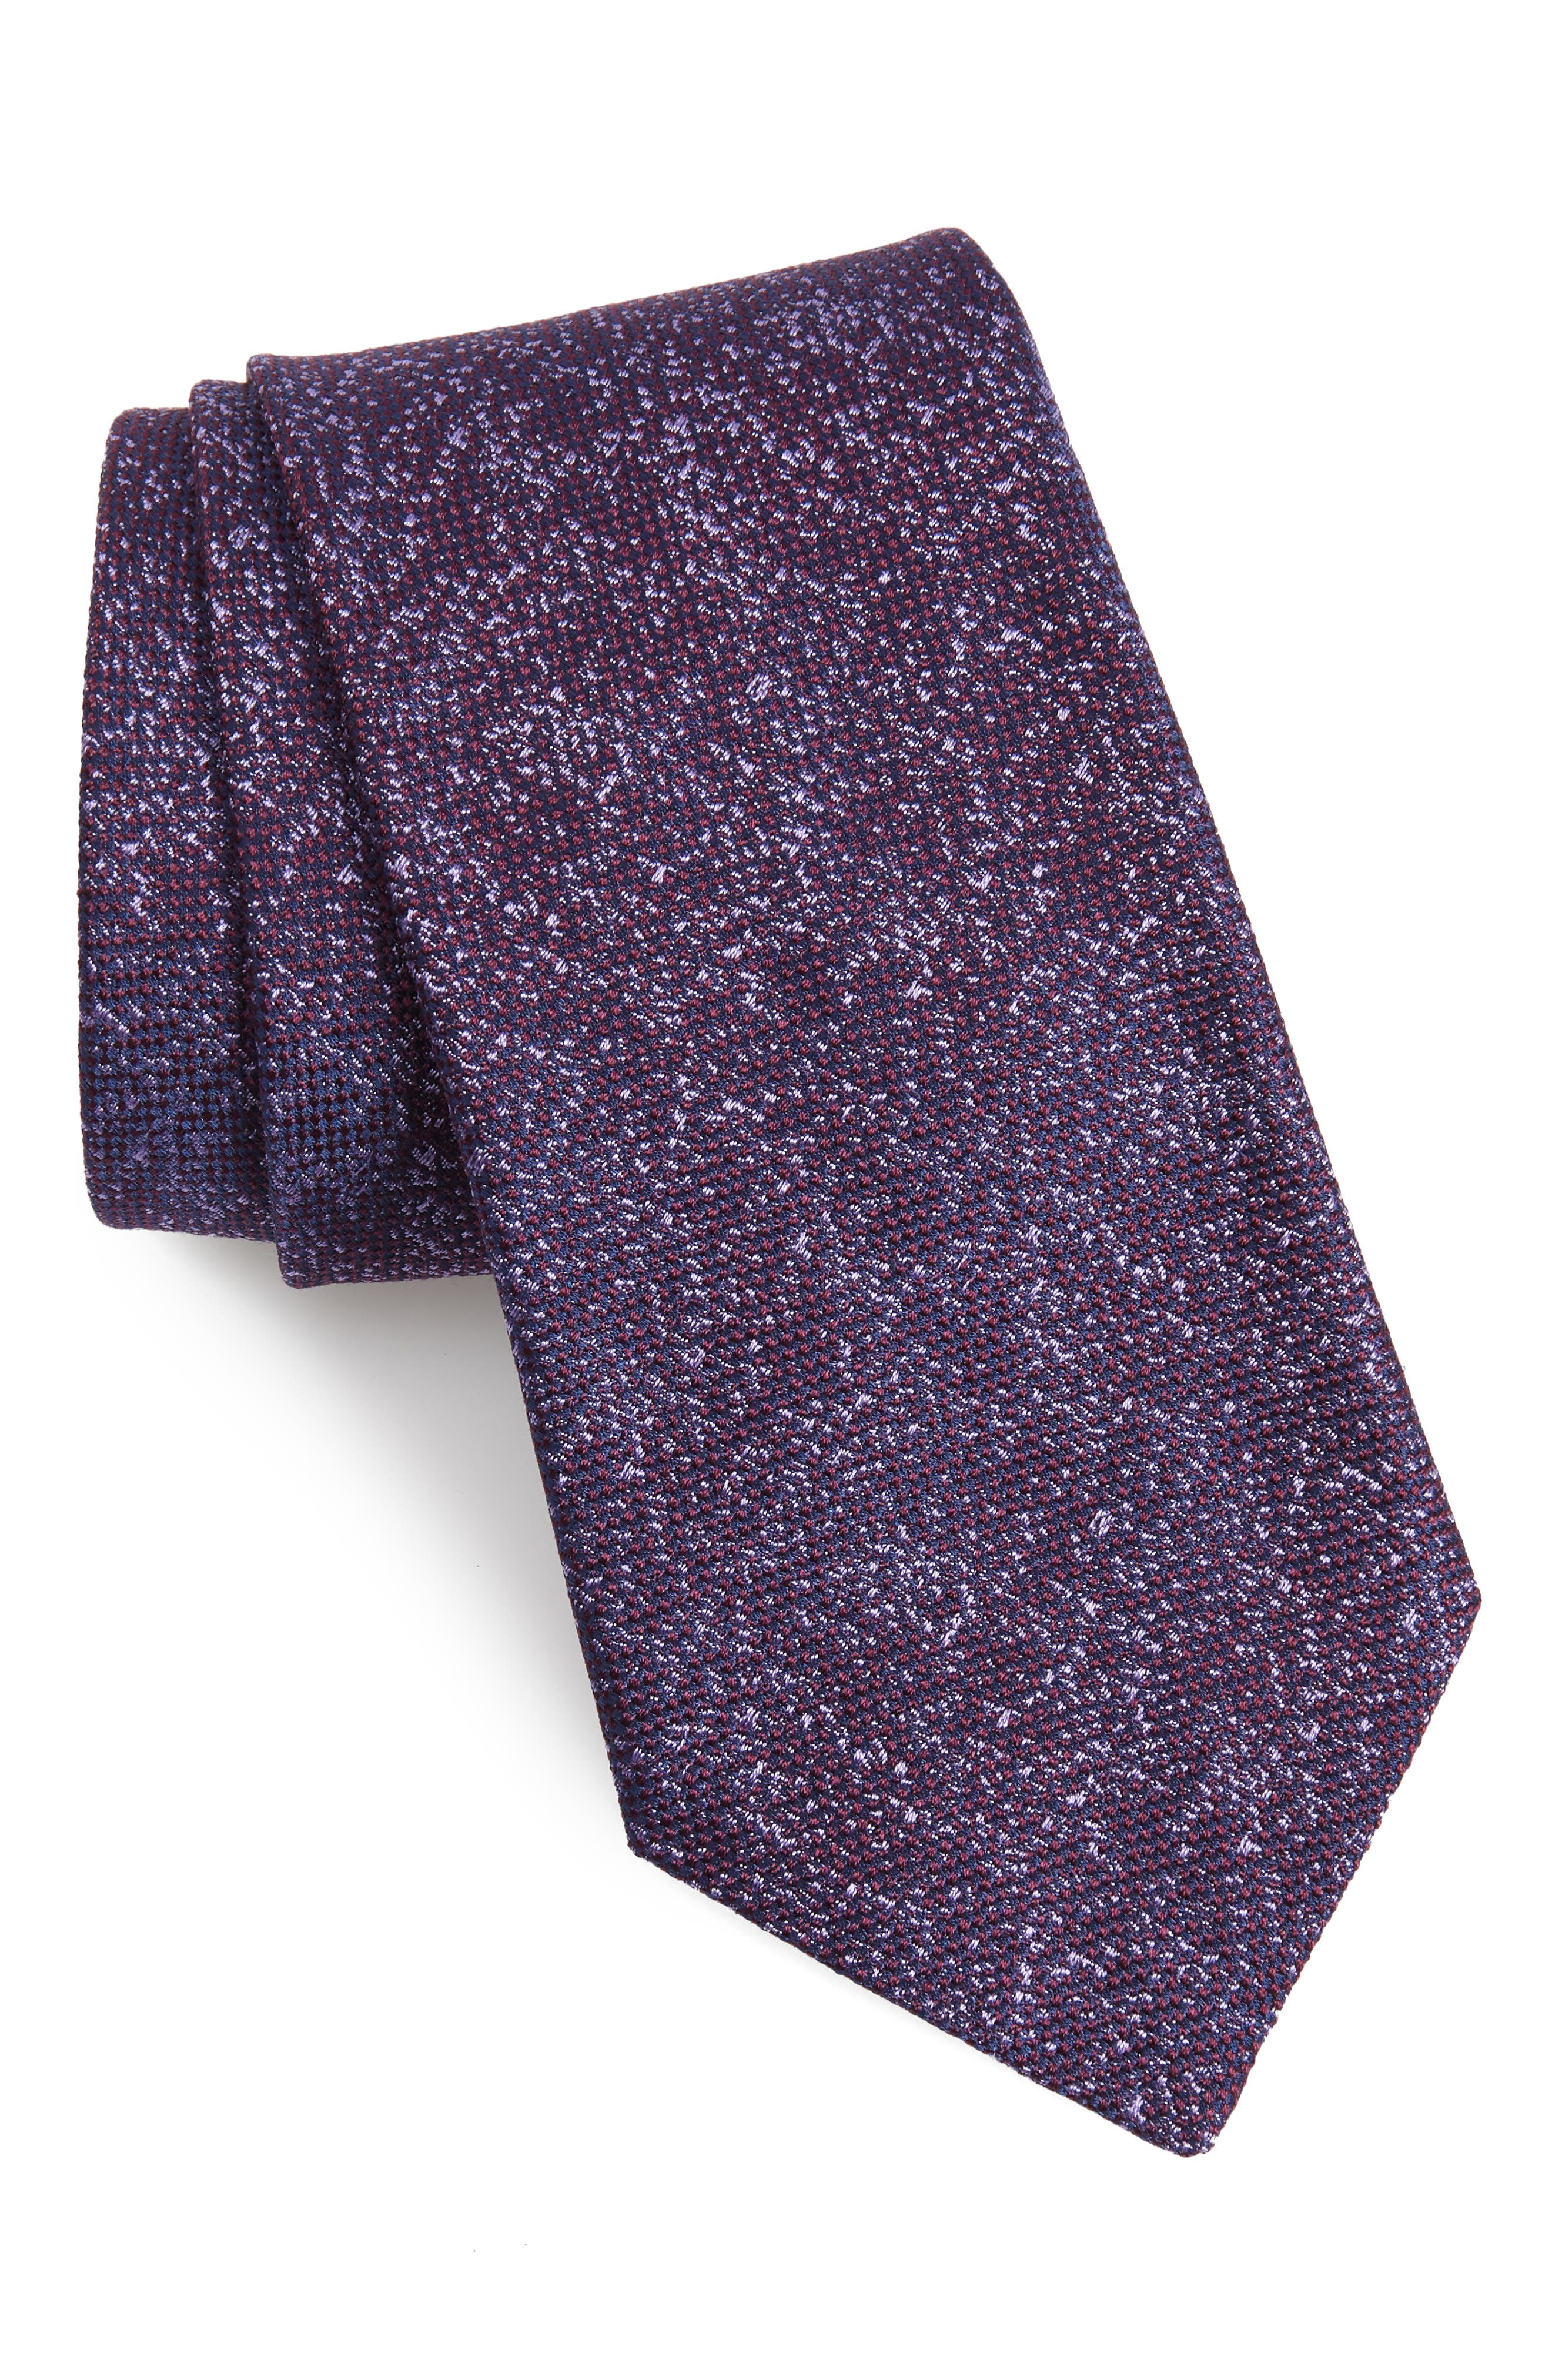 Solid Silk Tie,                             Main thumbnail 1, color,                             PURPLE